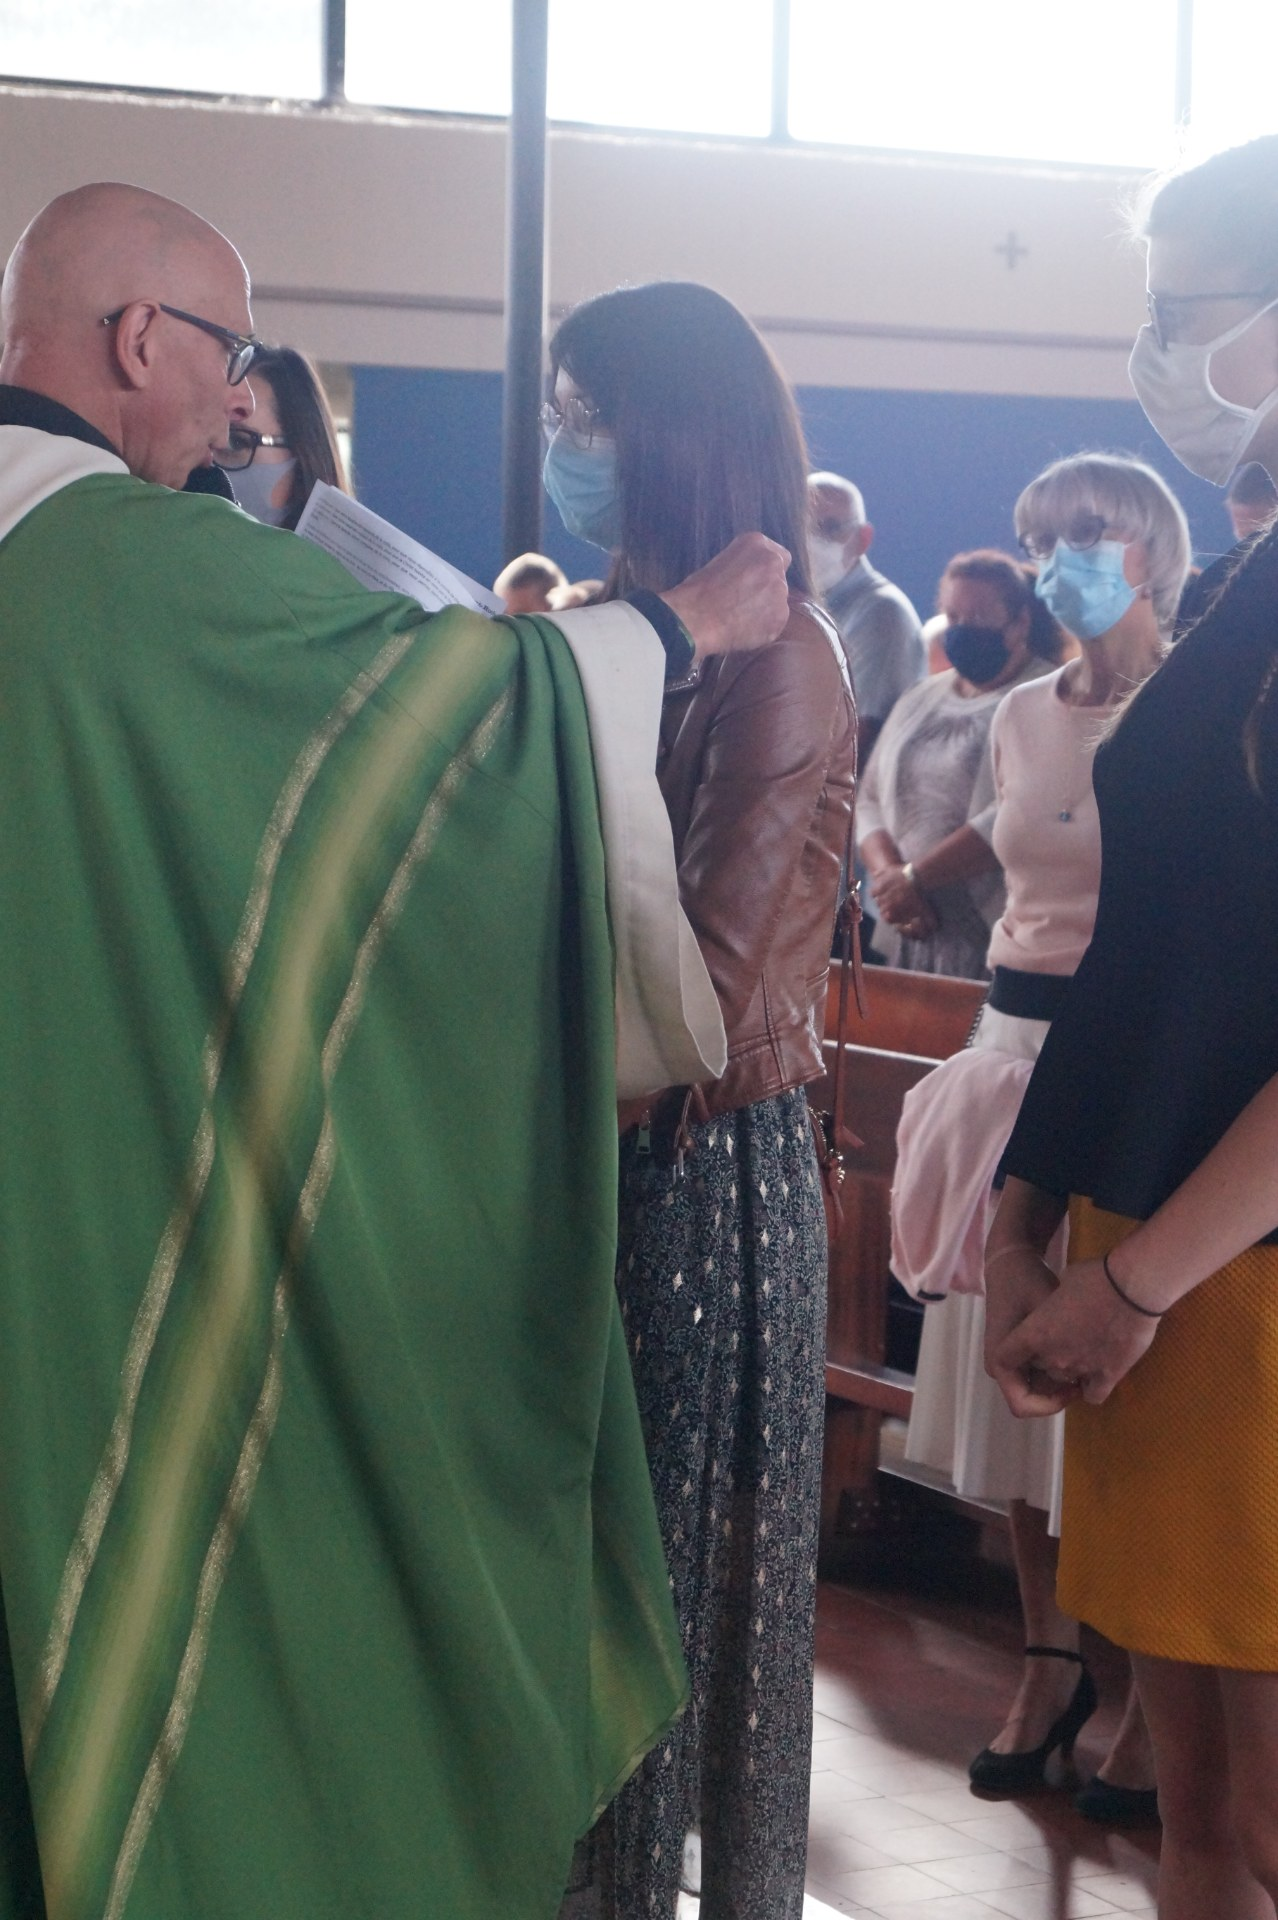 entree en catechumenat 6 sept 2020 (28)